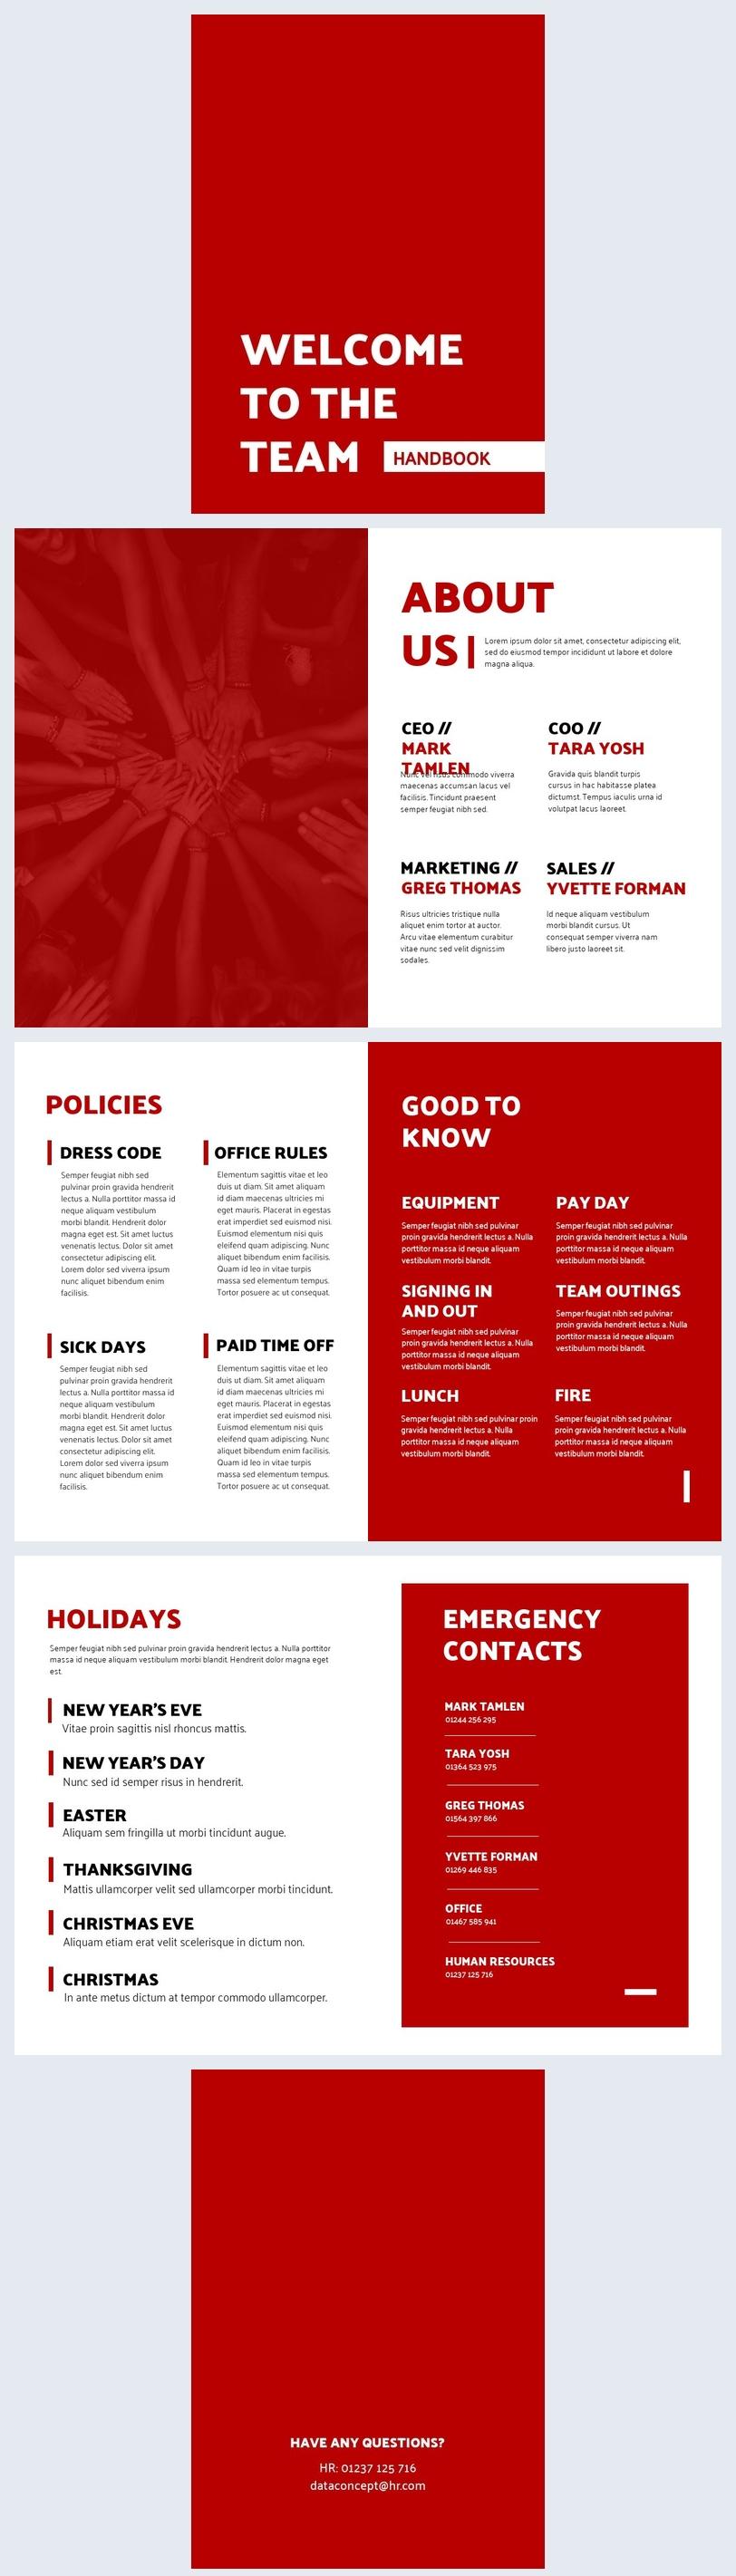 Company Handbook Template